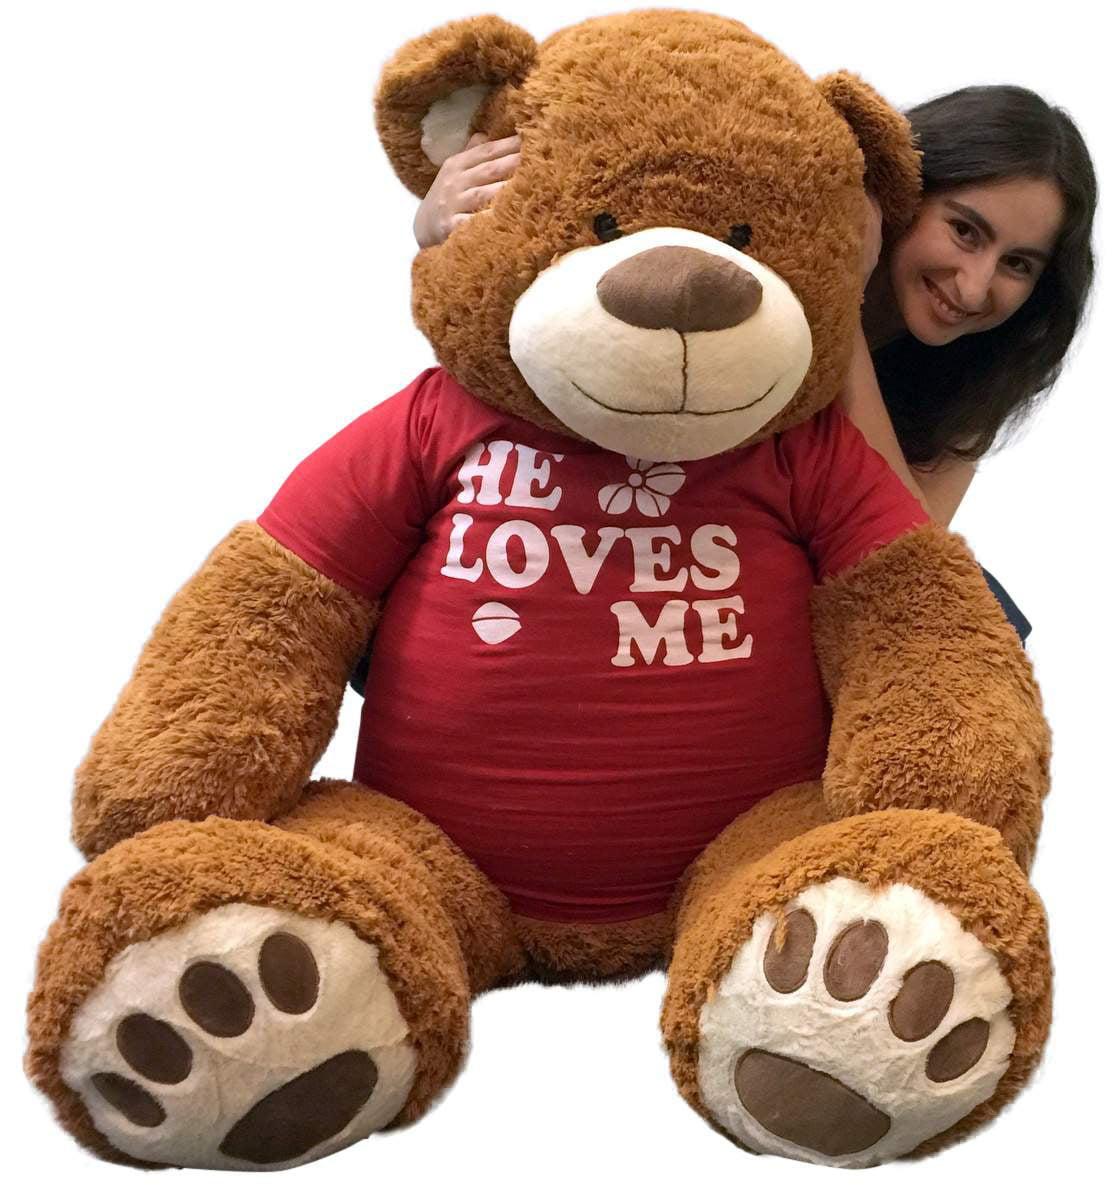 Big Plush 5 Foot Giant Teddy Bear 60 Inch Soft Brown Wears HE LOVES ME T-shirt by BigPlush